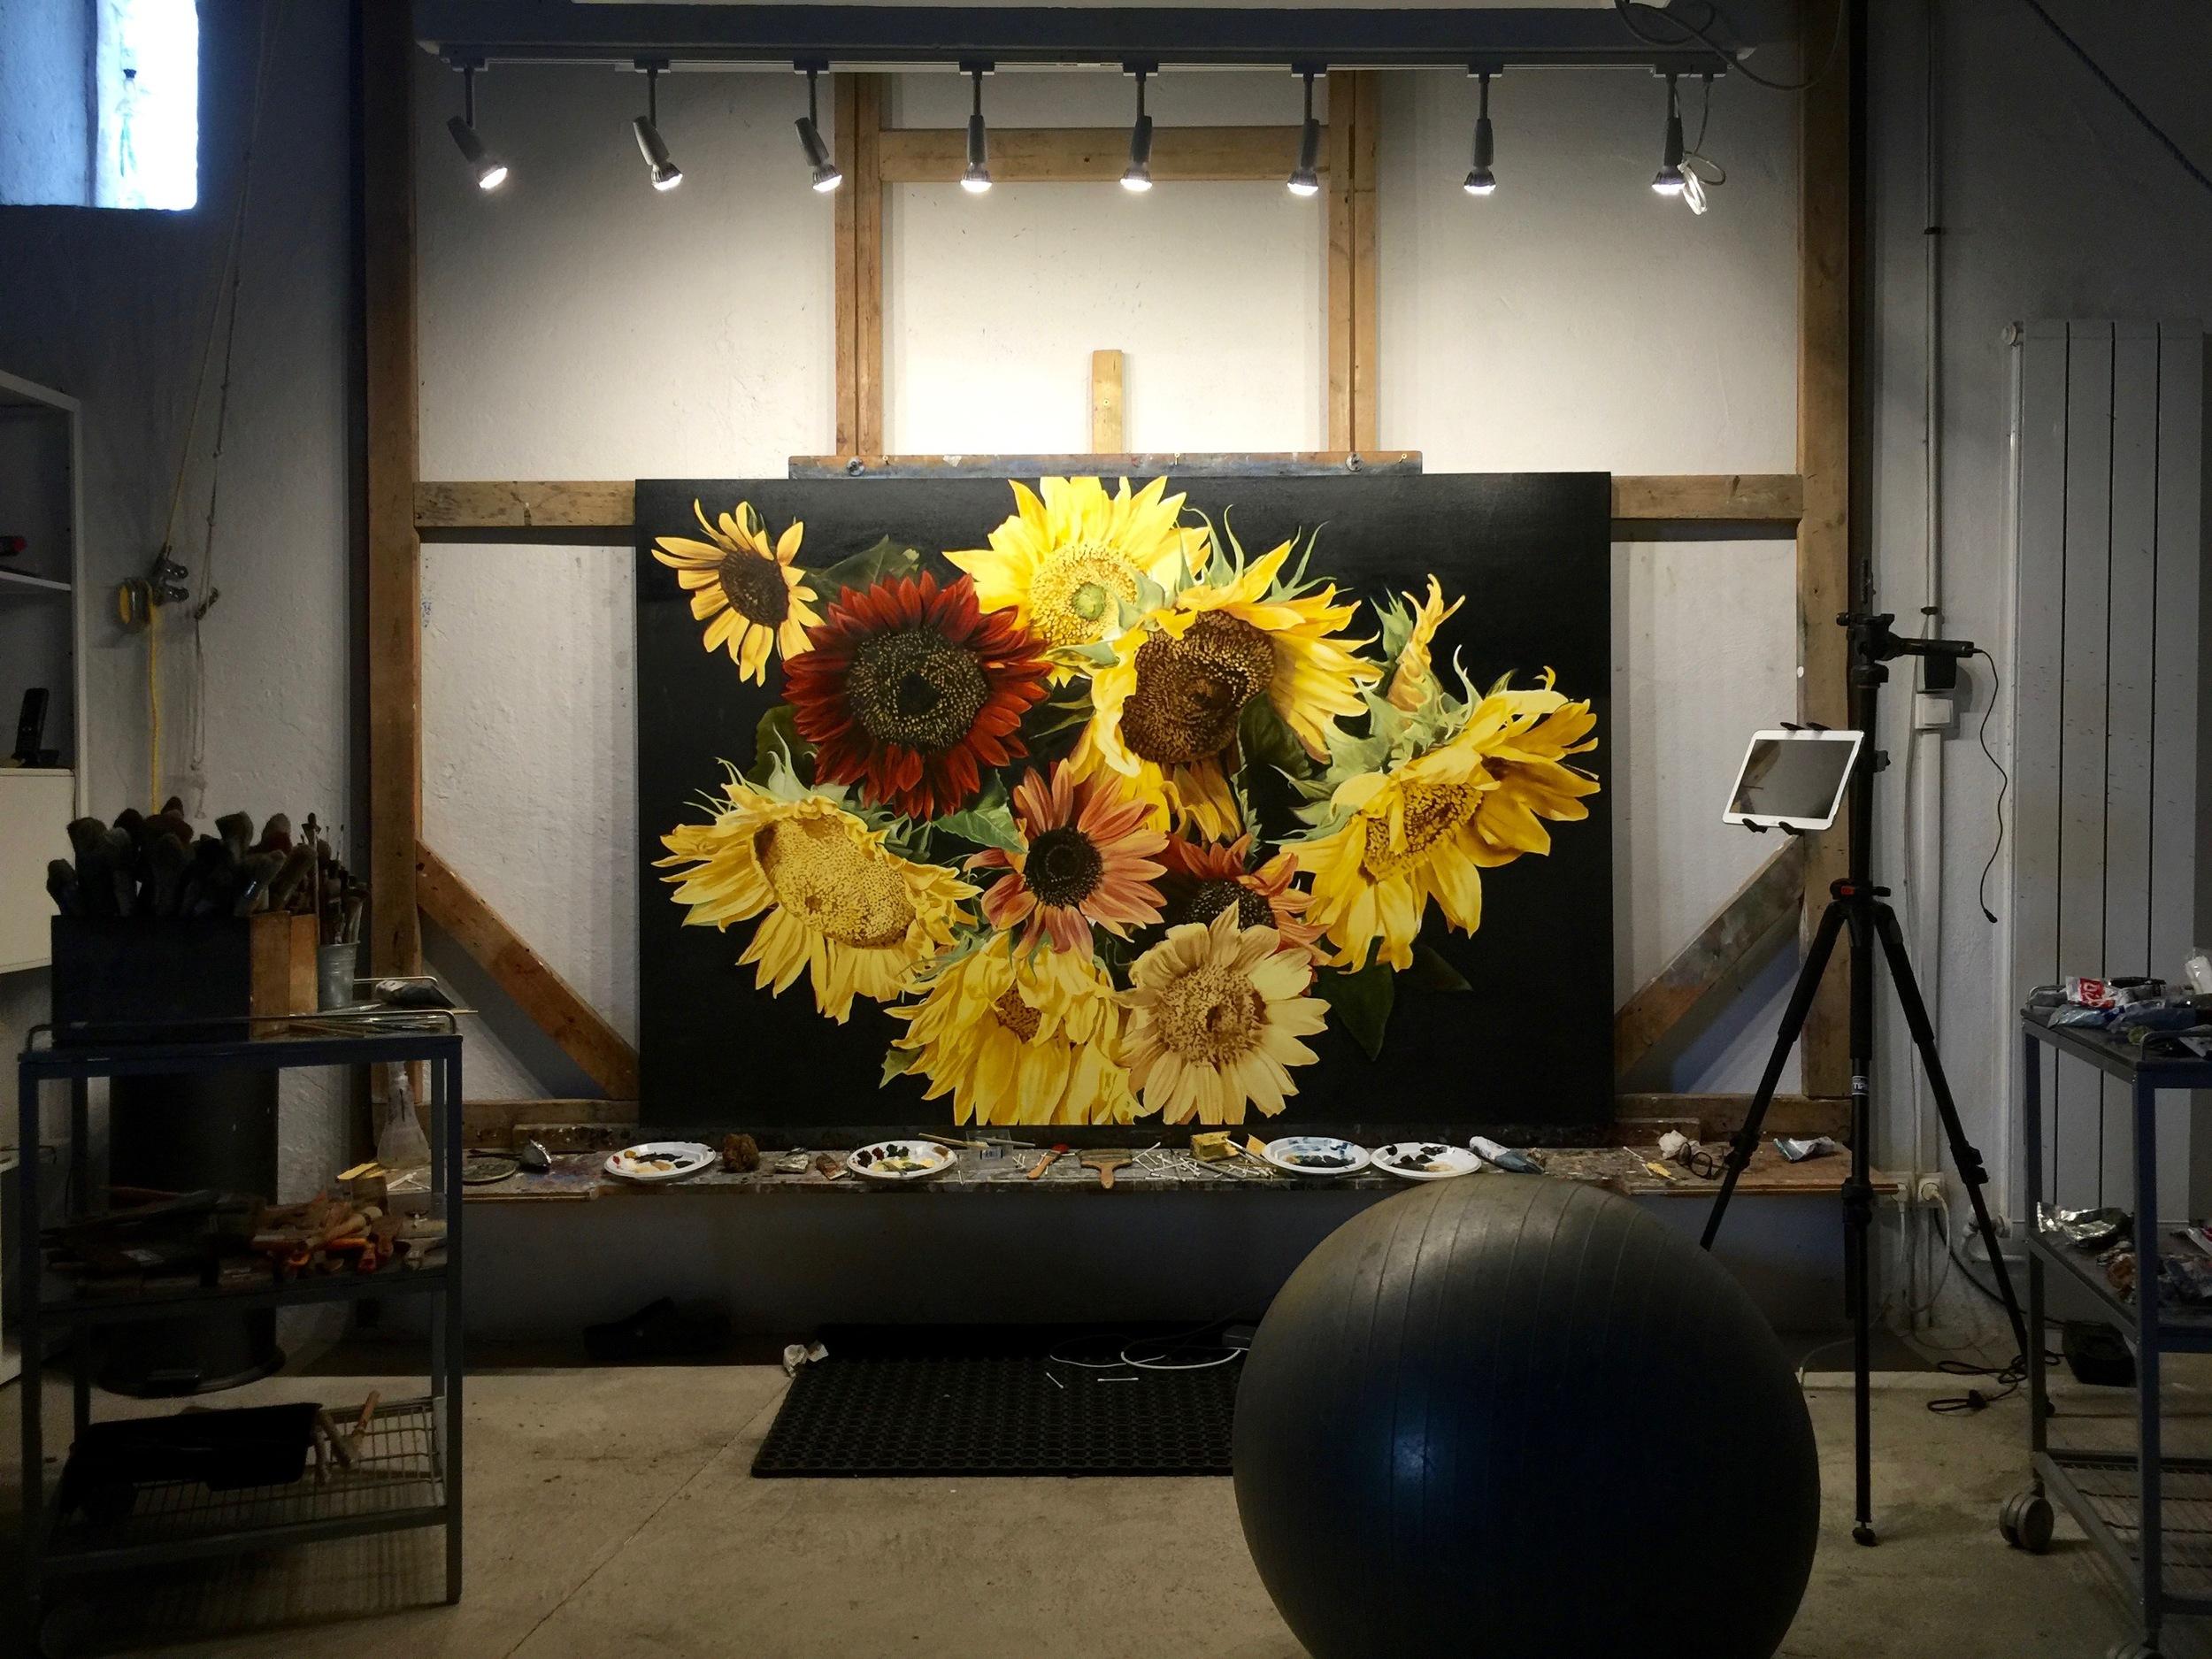 Thomas-Darnell-Painting-Beauty-jessewaugh.com-21.jpg